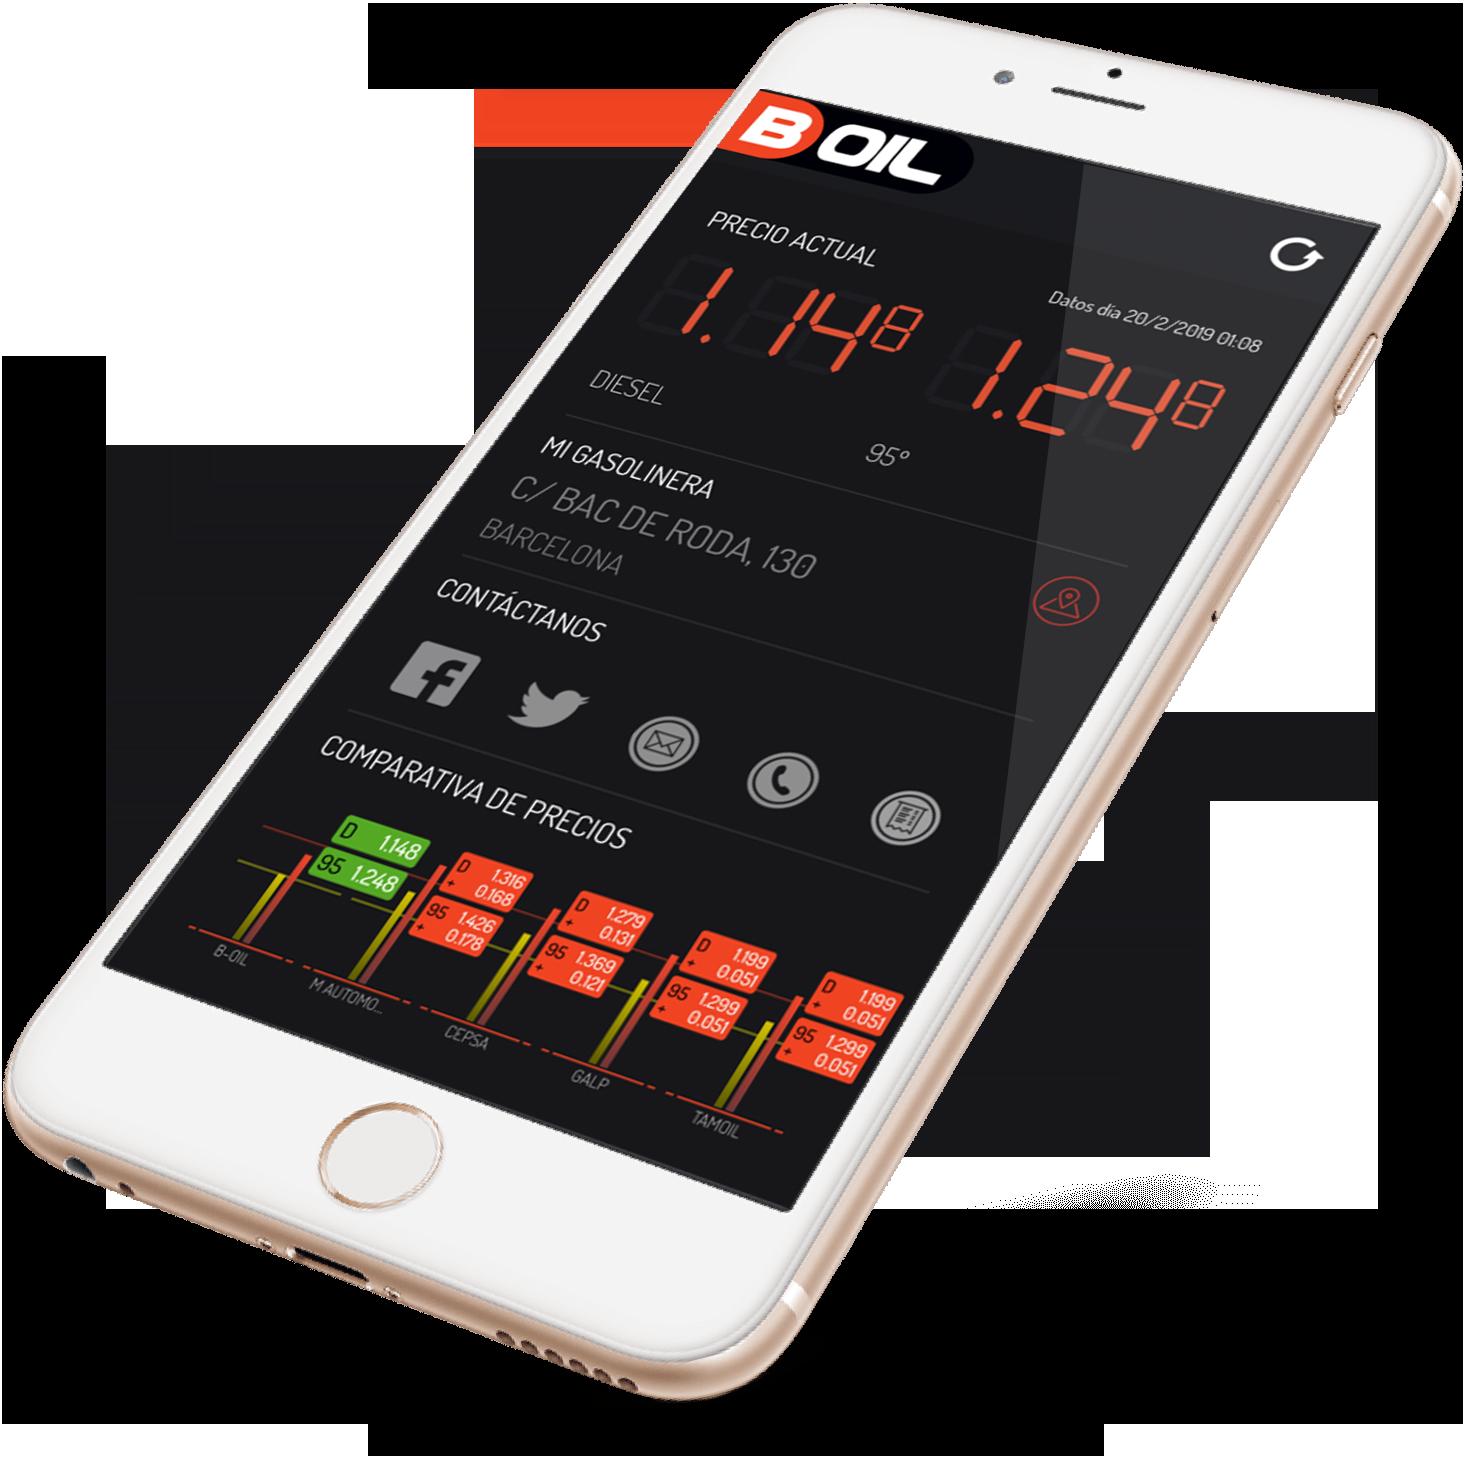 B-Oil mobile app solution in iPhoneX